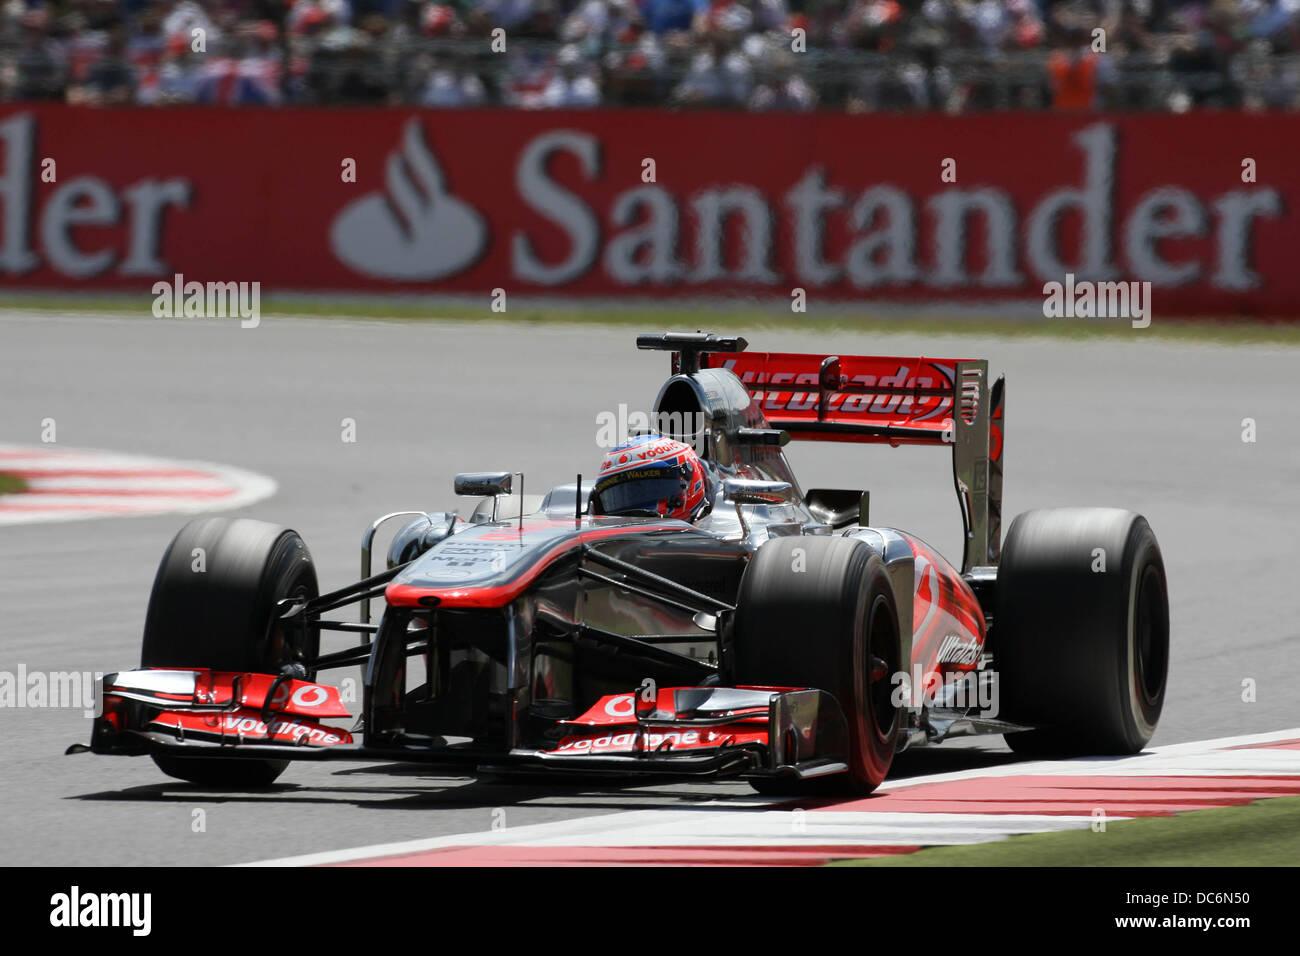 fa63c9d1393 Mclaren Mercedes F1 Stock Photos   Mclaren Mercedes F1 Stock Images ...